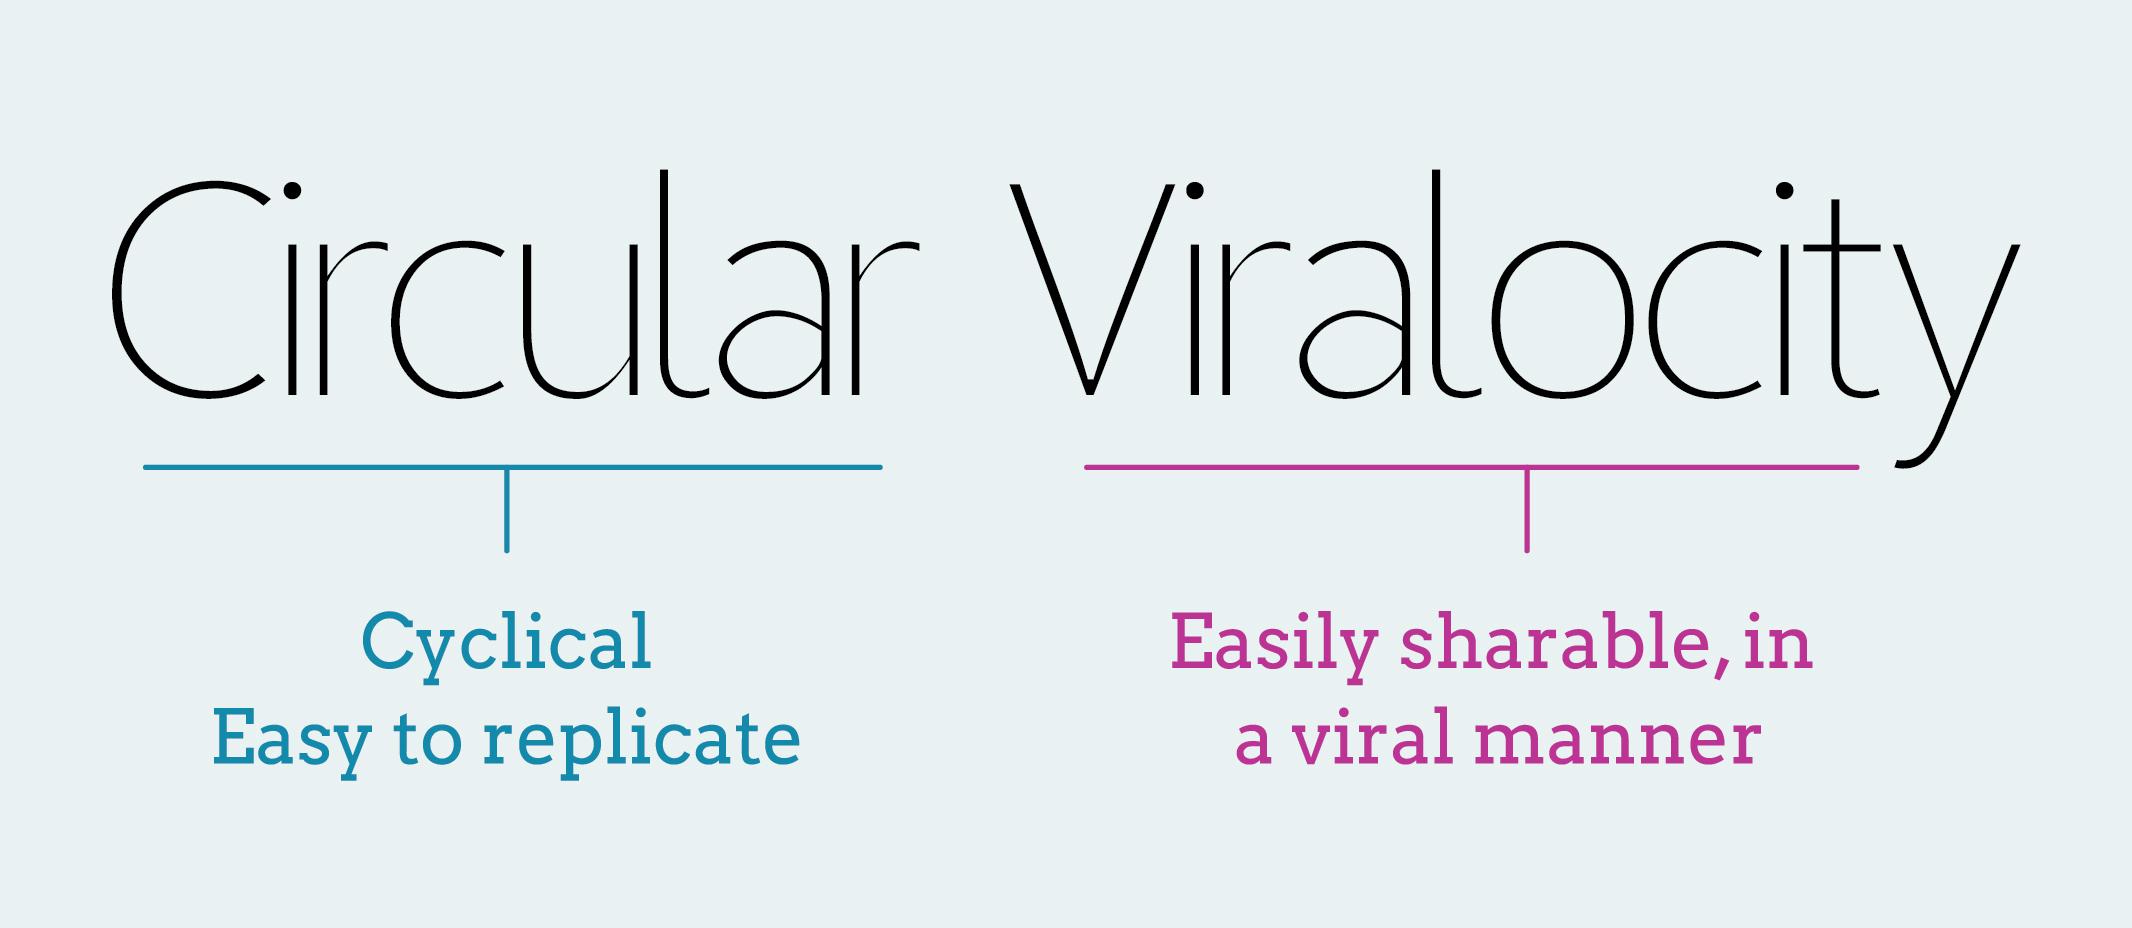 Definition-Circular-Viralicity-Social-media-maximize-your-content-infographic-04